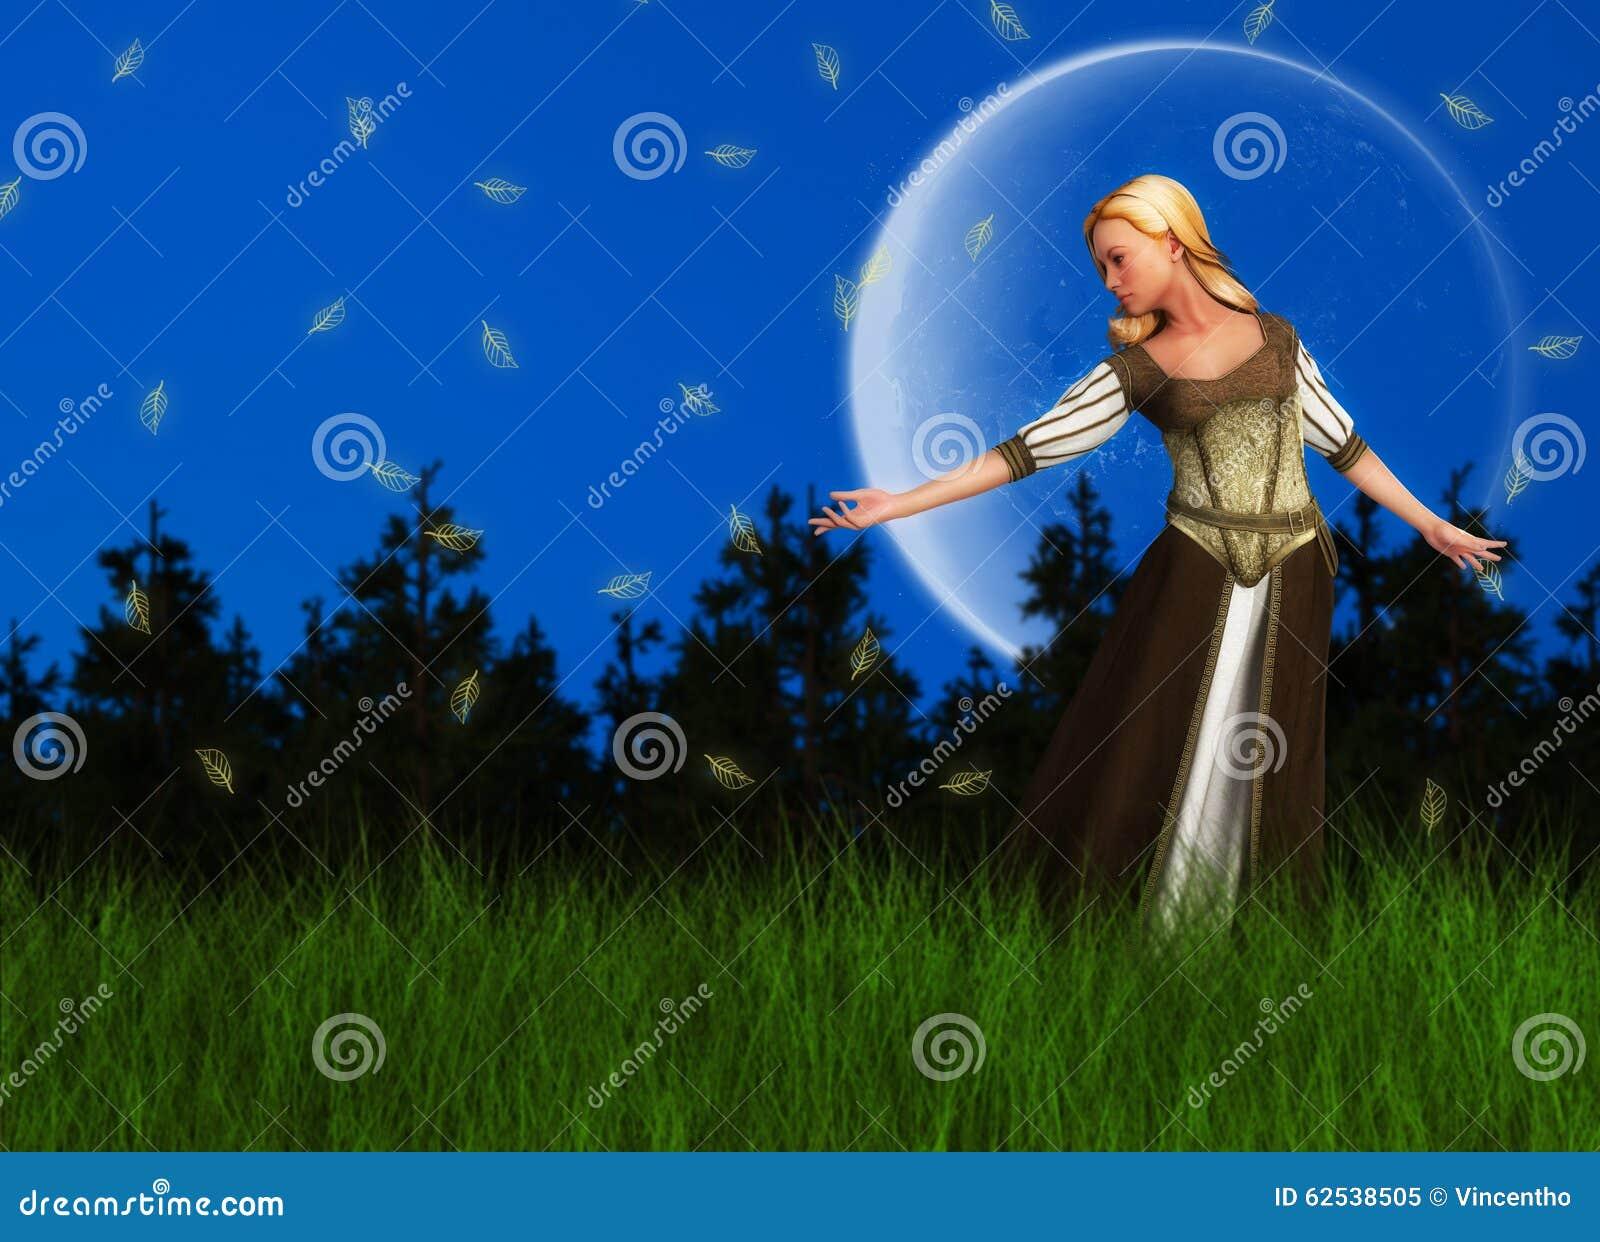 童话不可思议的梦想公主Illustration